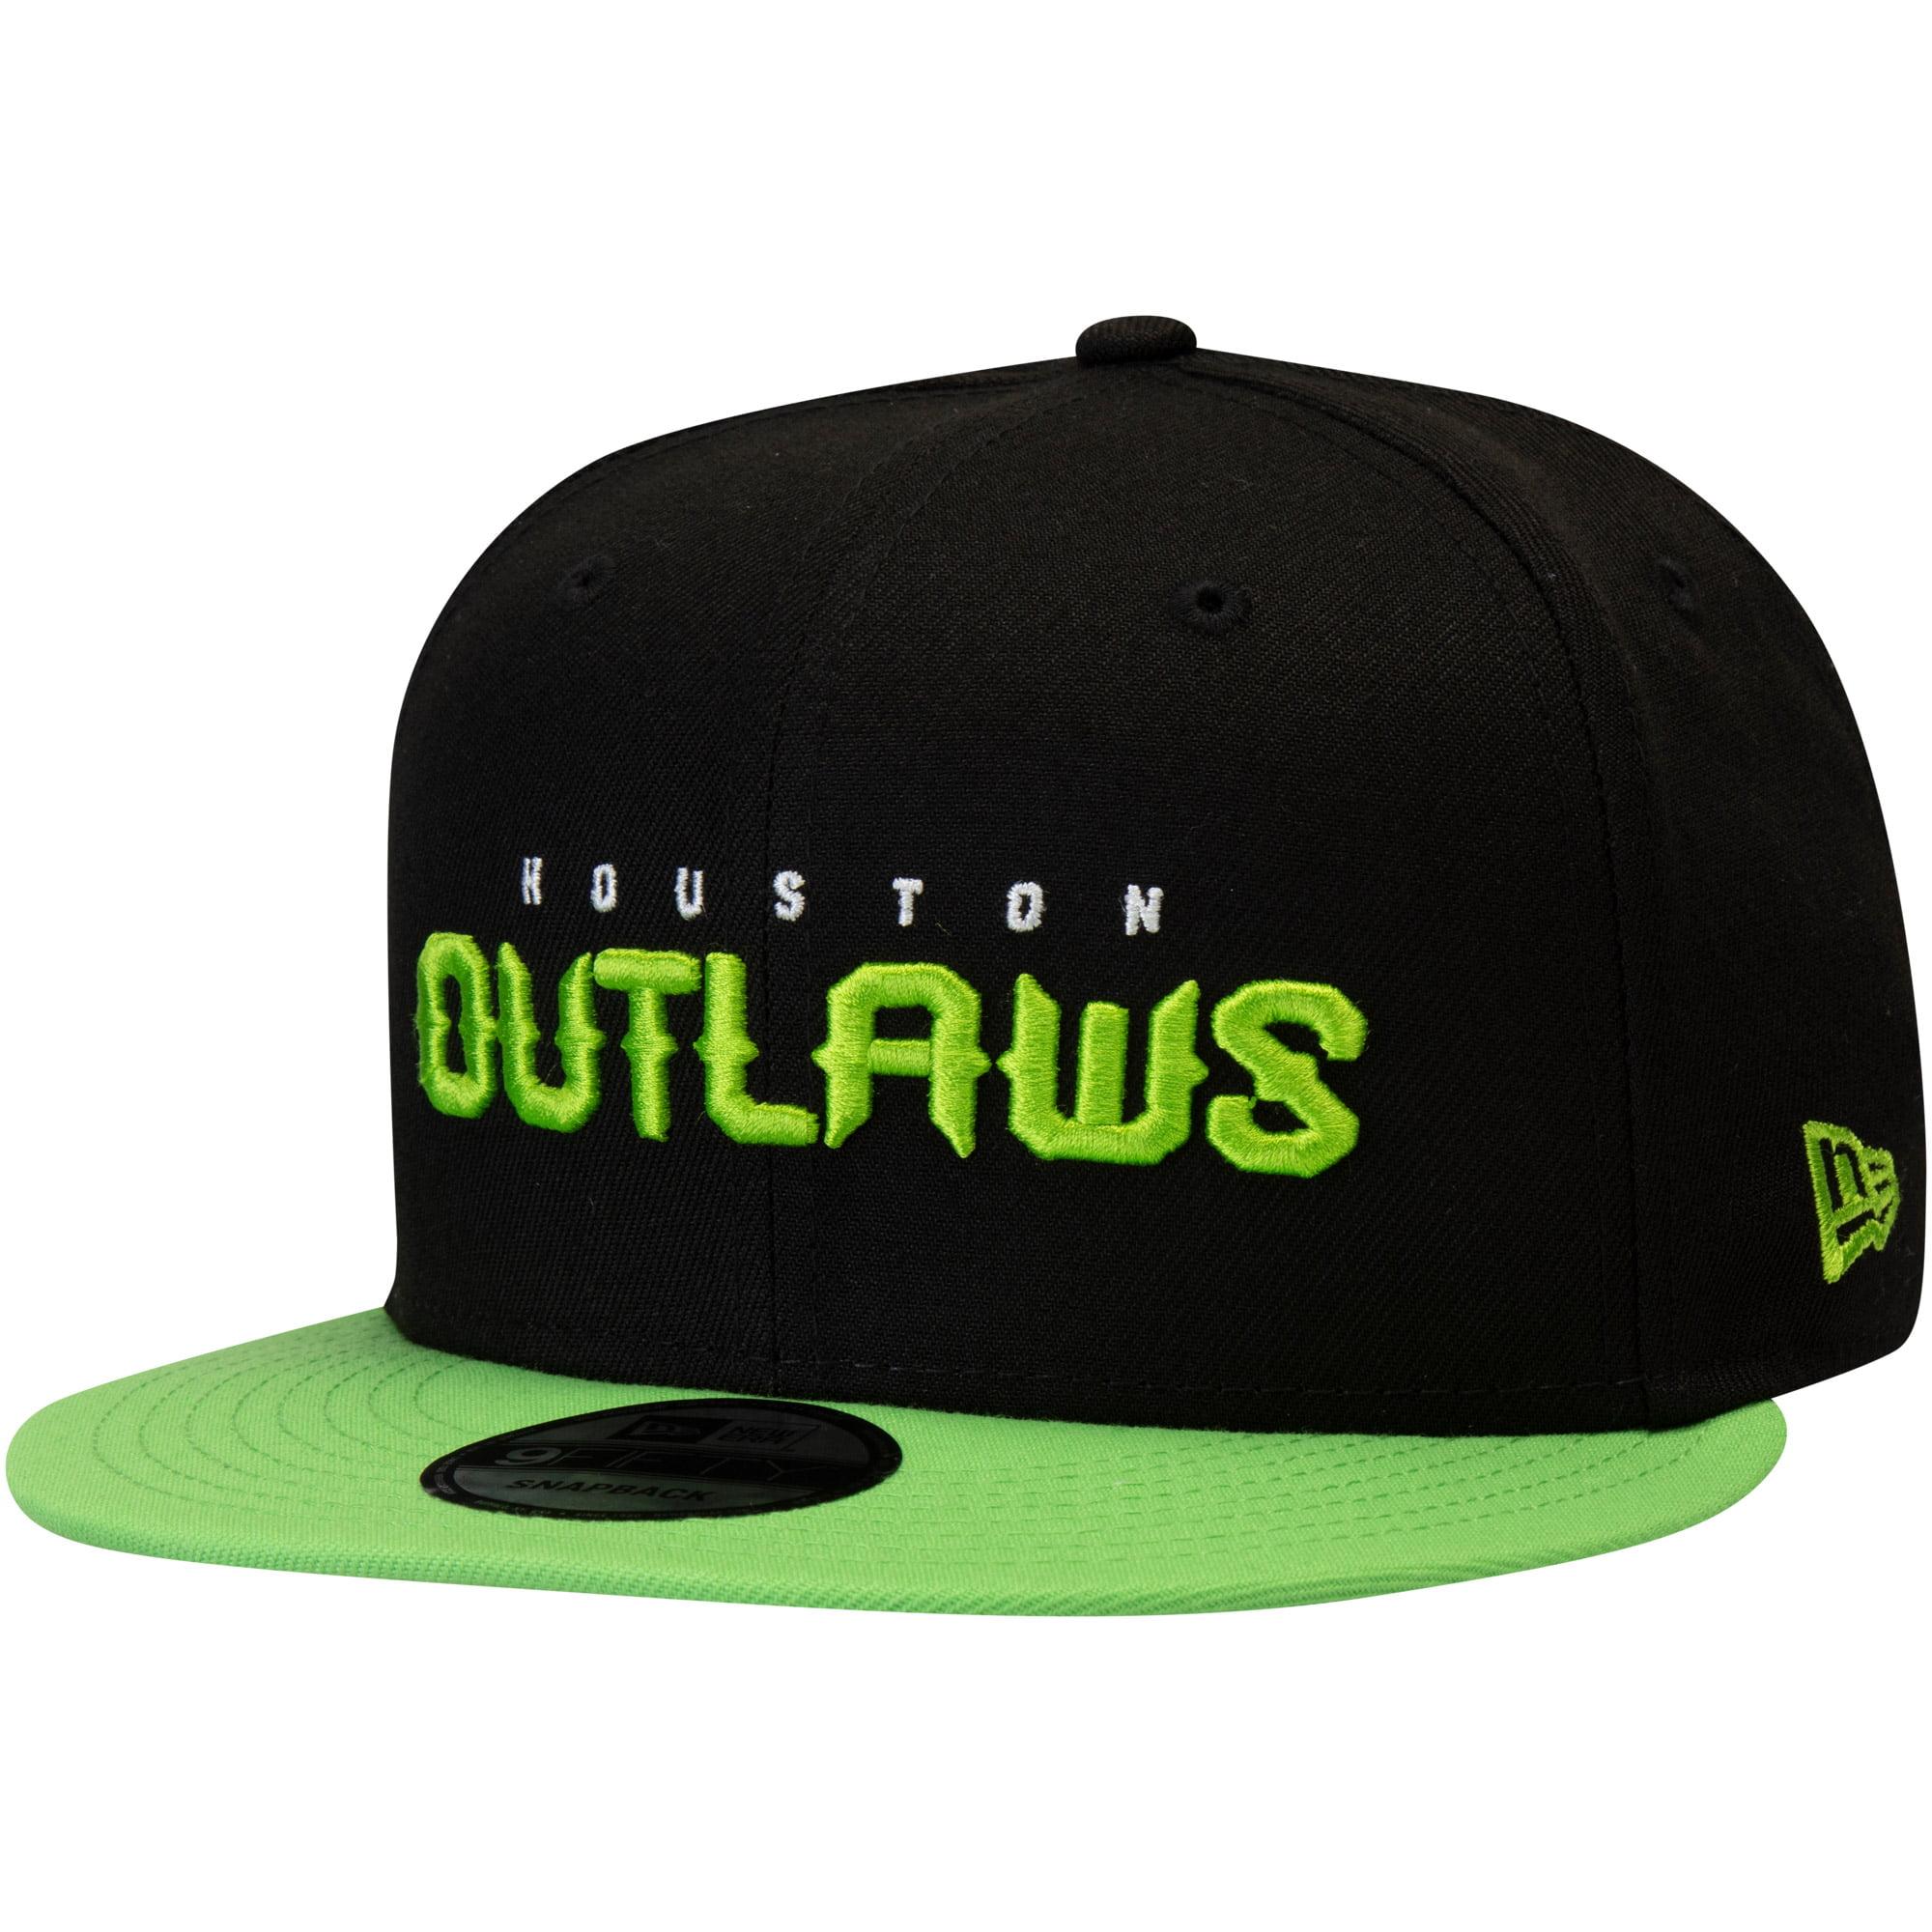 Houston Outlaws Overwatch League New Era Two-Tone Team Snapback Adjustable Hat - Black - OSFA